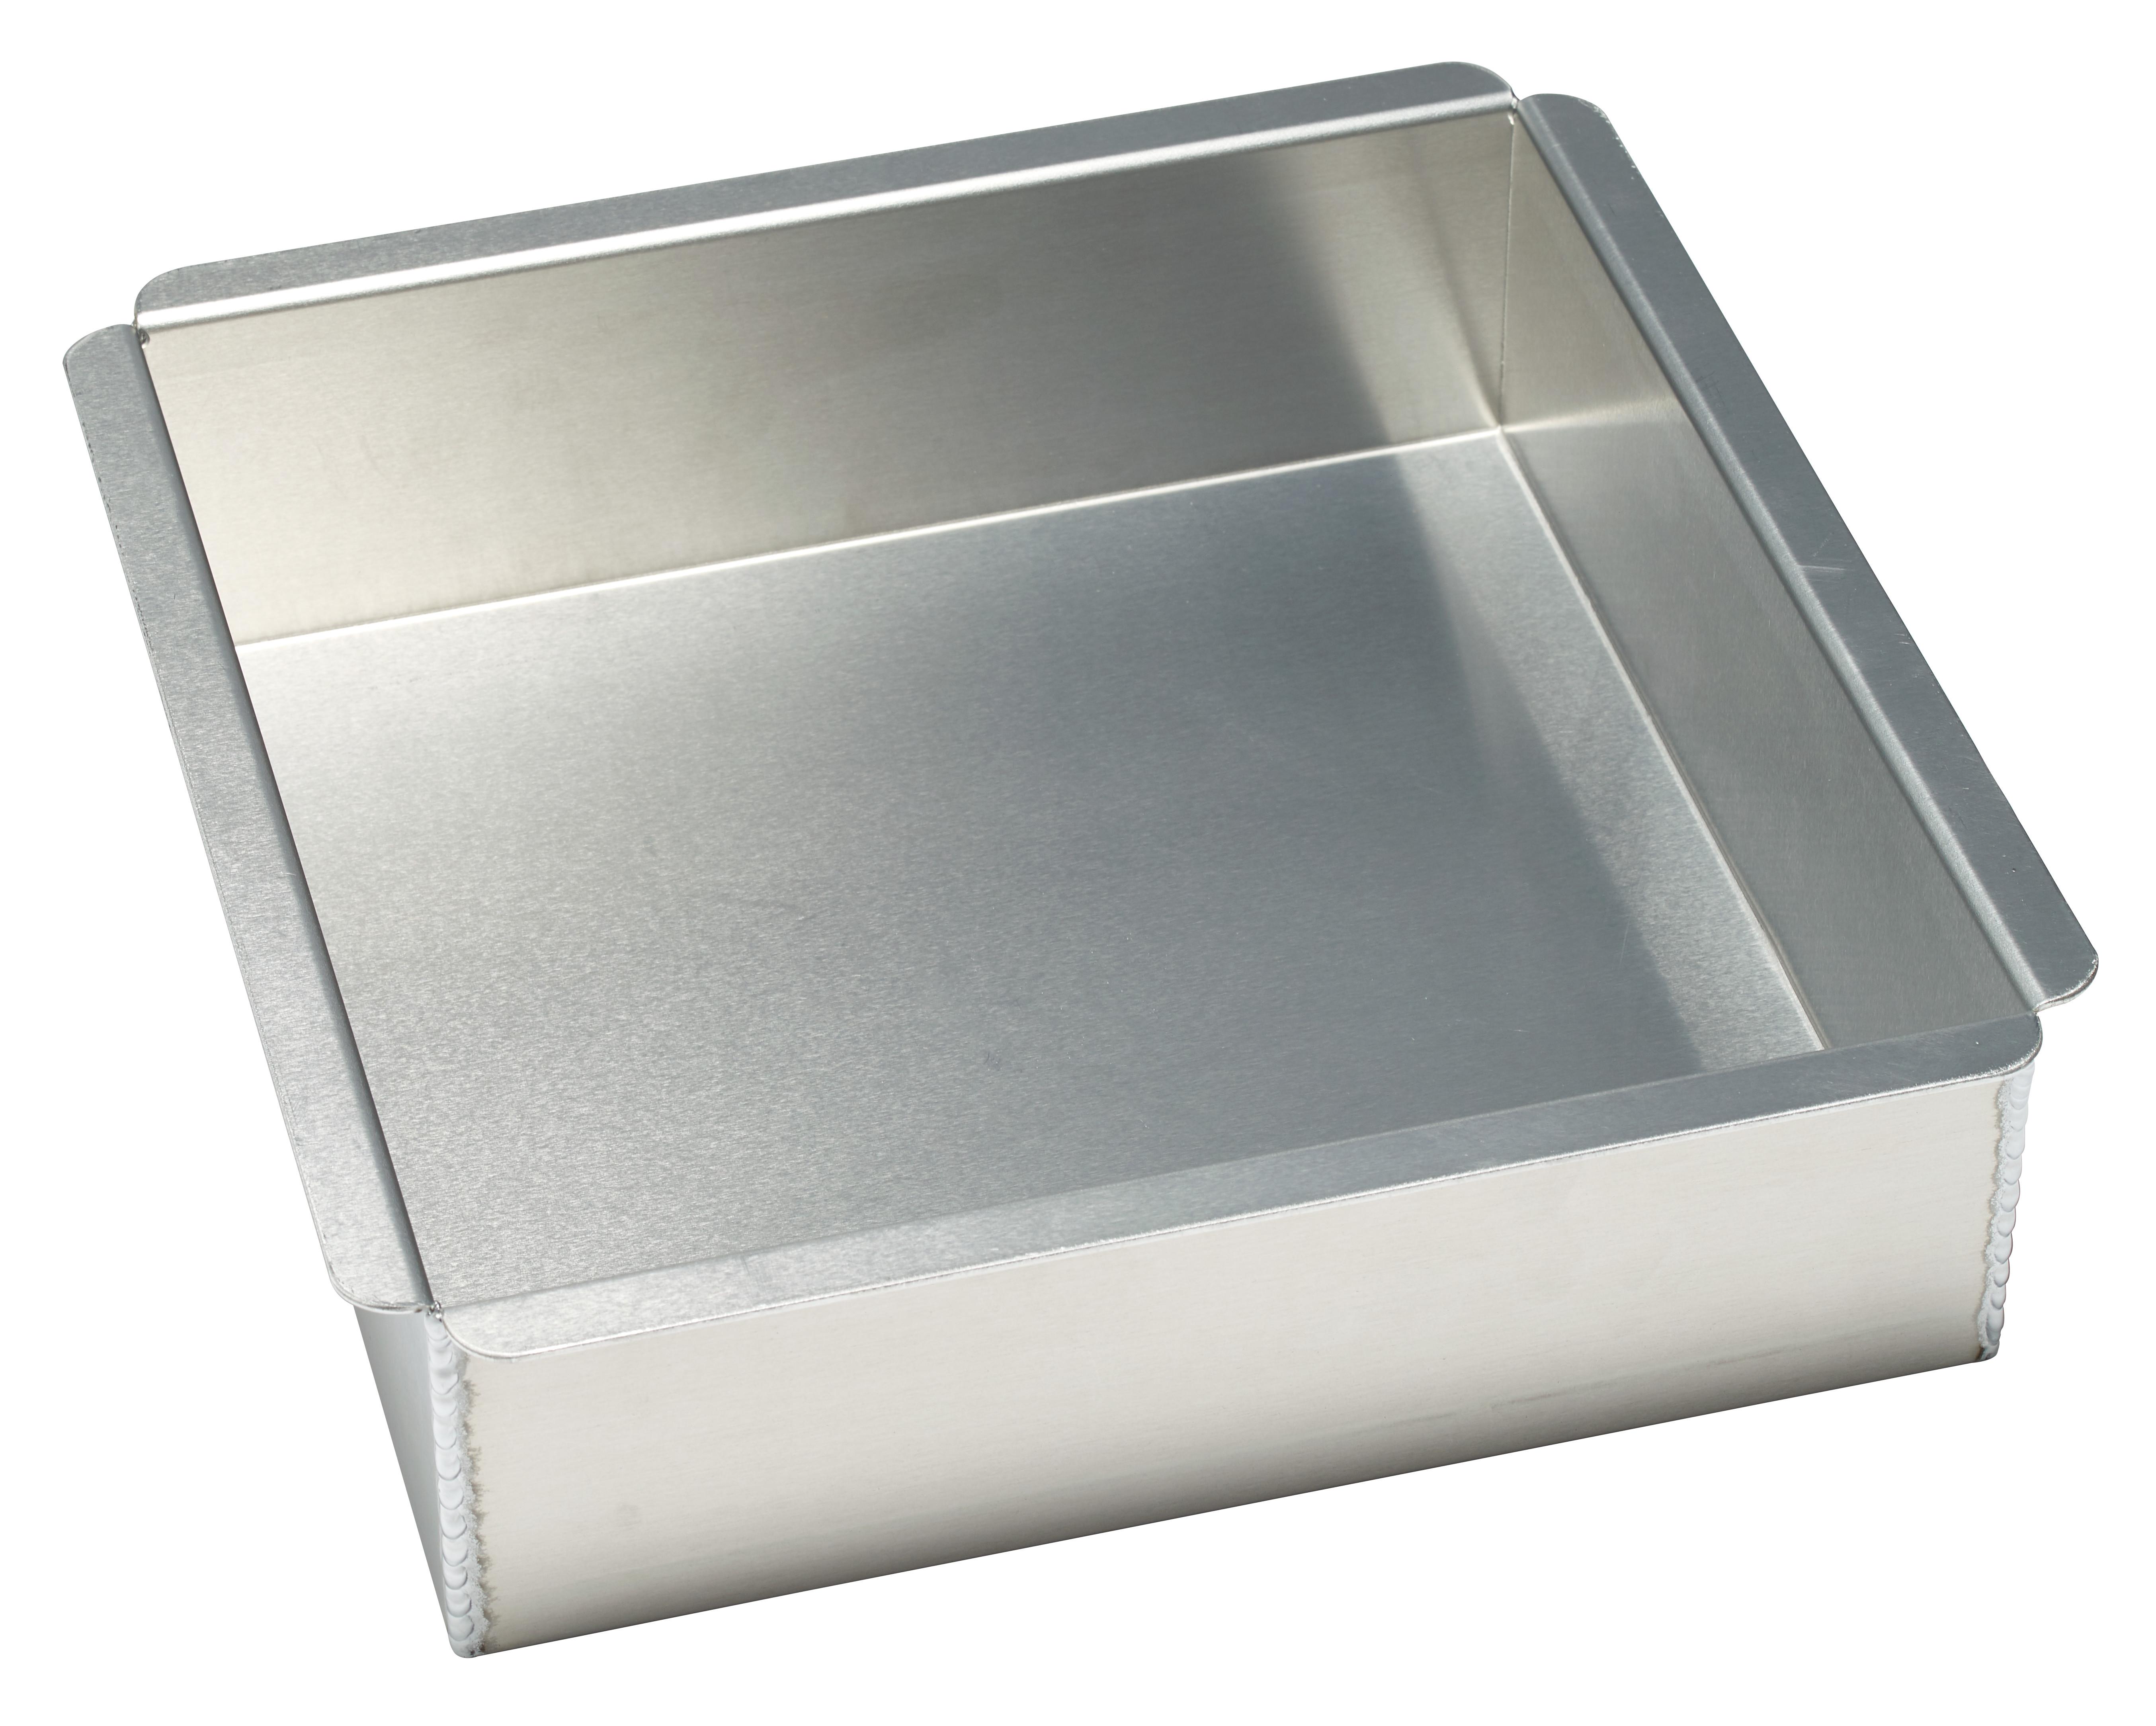 "14 Gauge Square Aluminum 10""L X 10""W X 3""H"